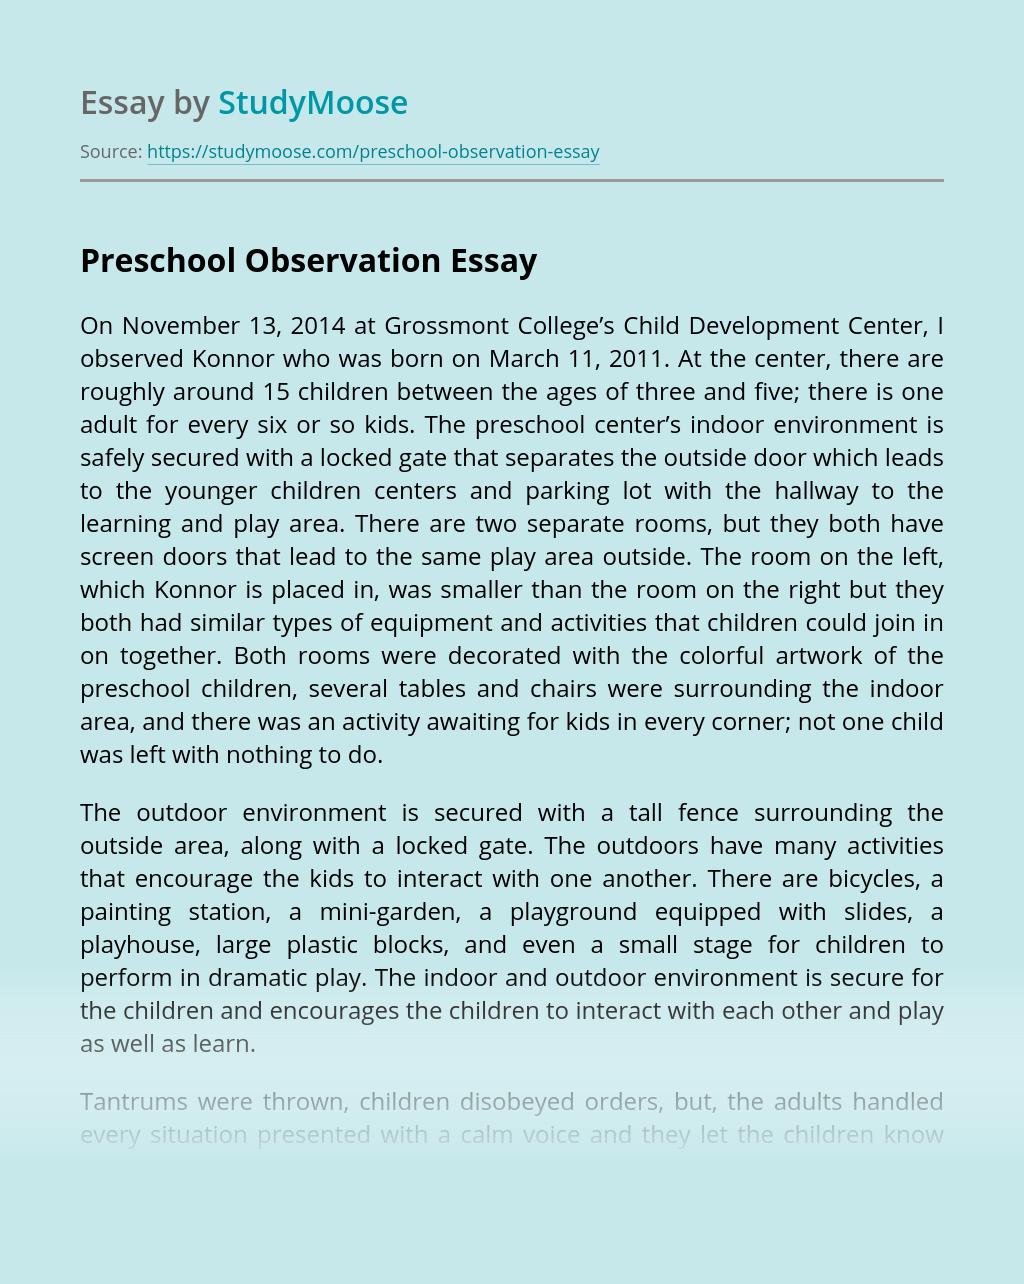 Preschool Observation